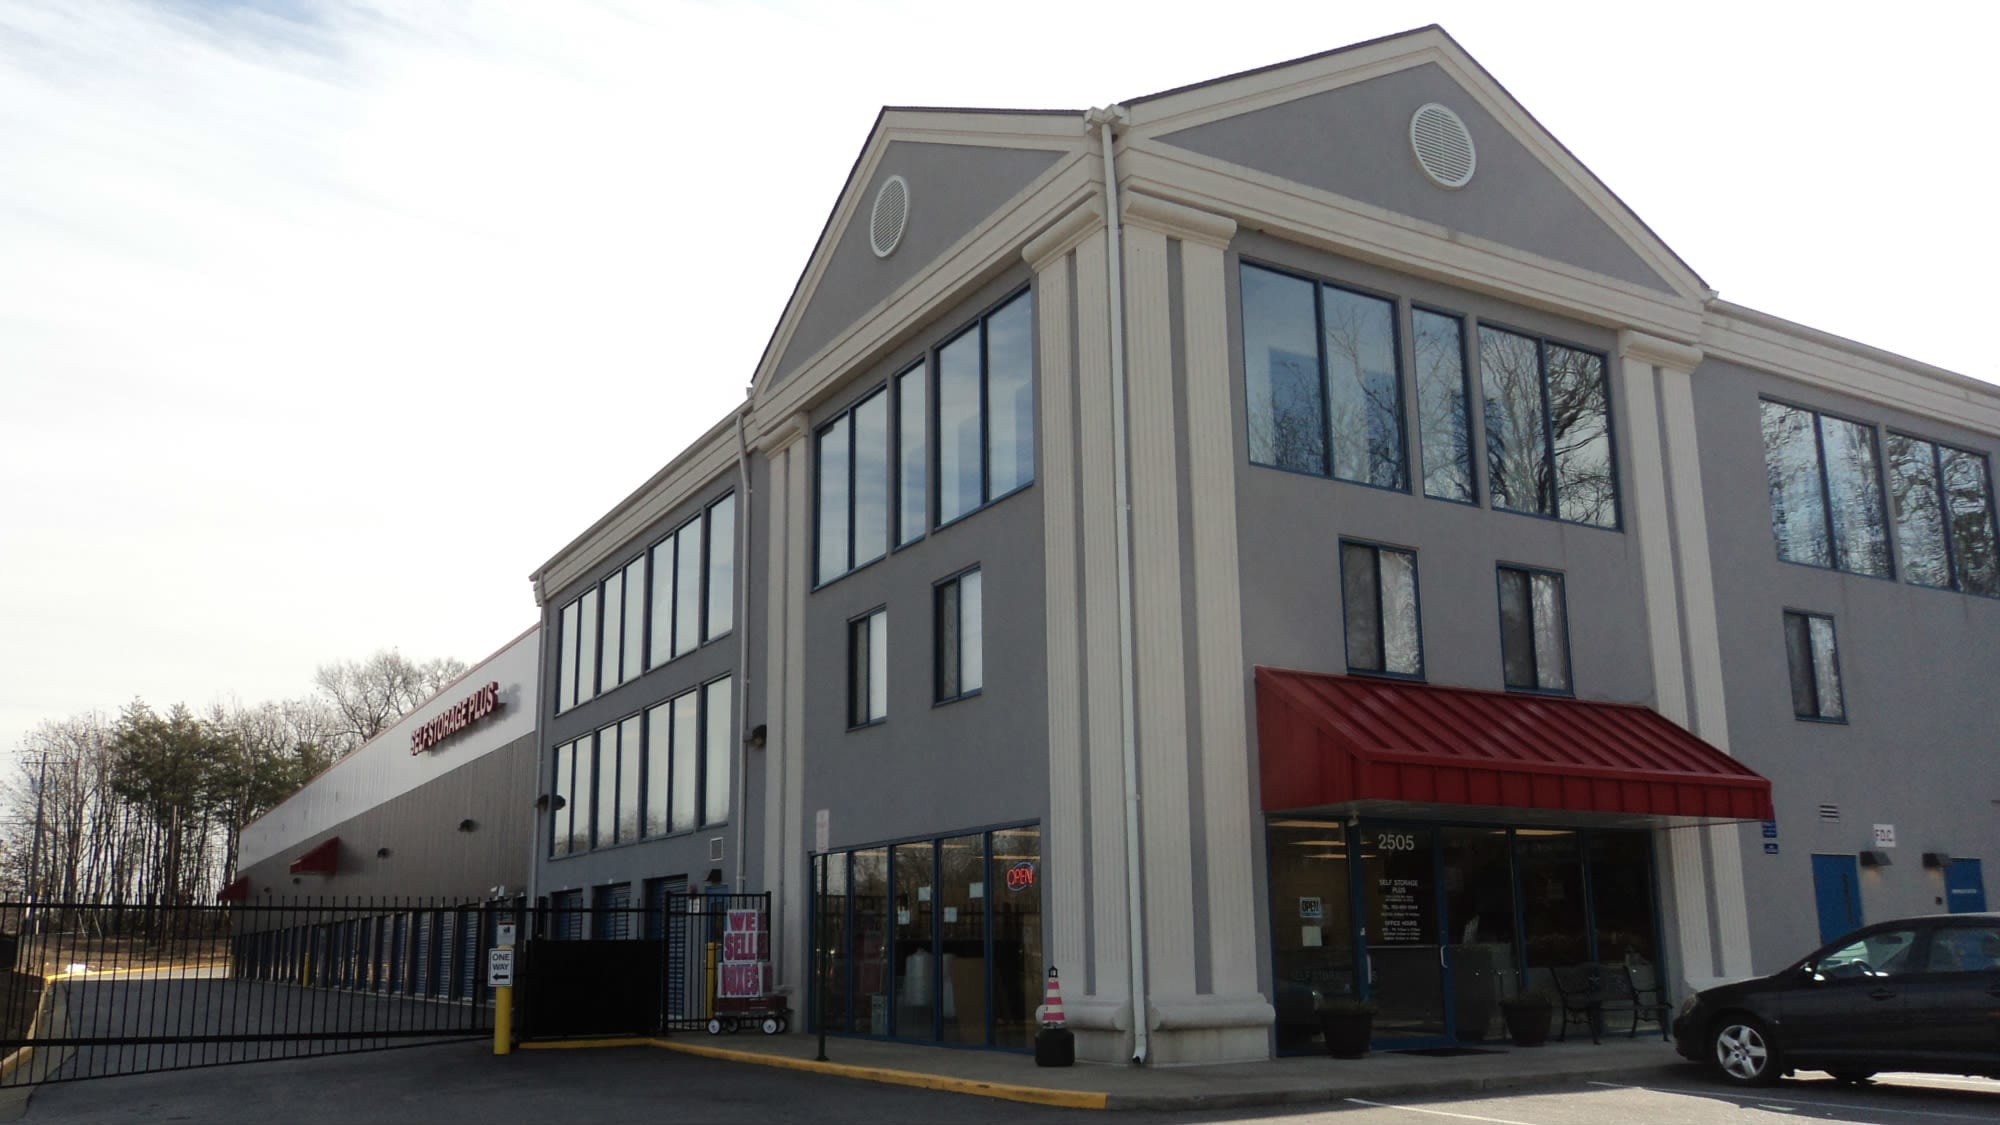 Entrance to Self Storage Plus in Woodbridge, VA